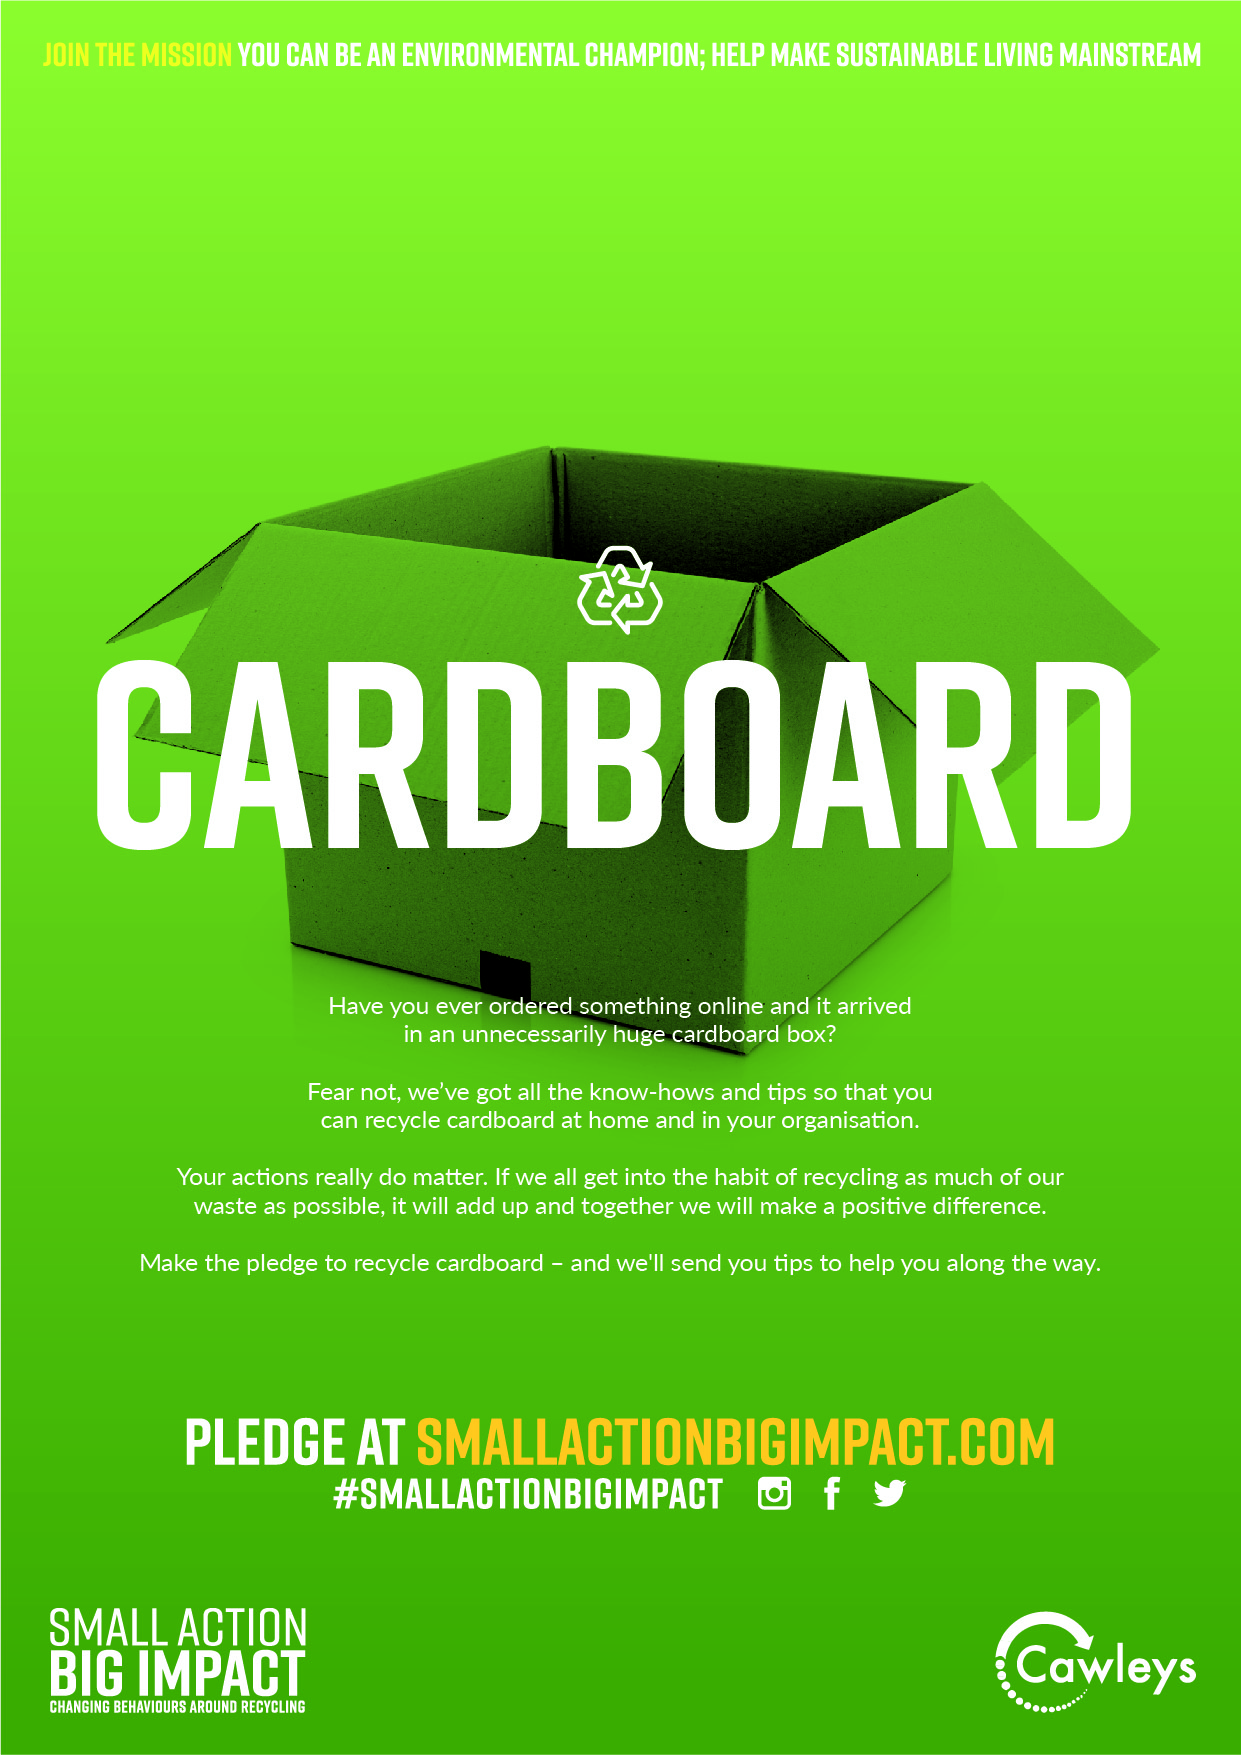 sabi poster no pledge number_cardboard.jpg